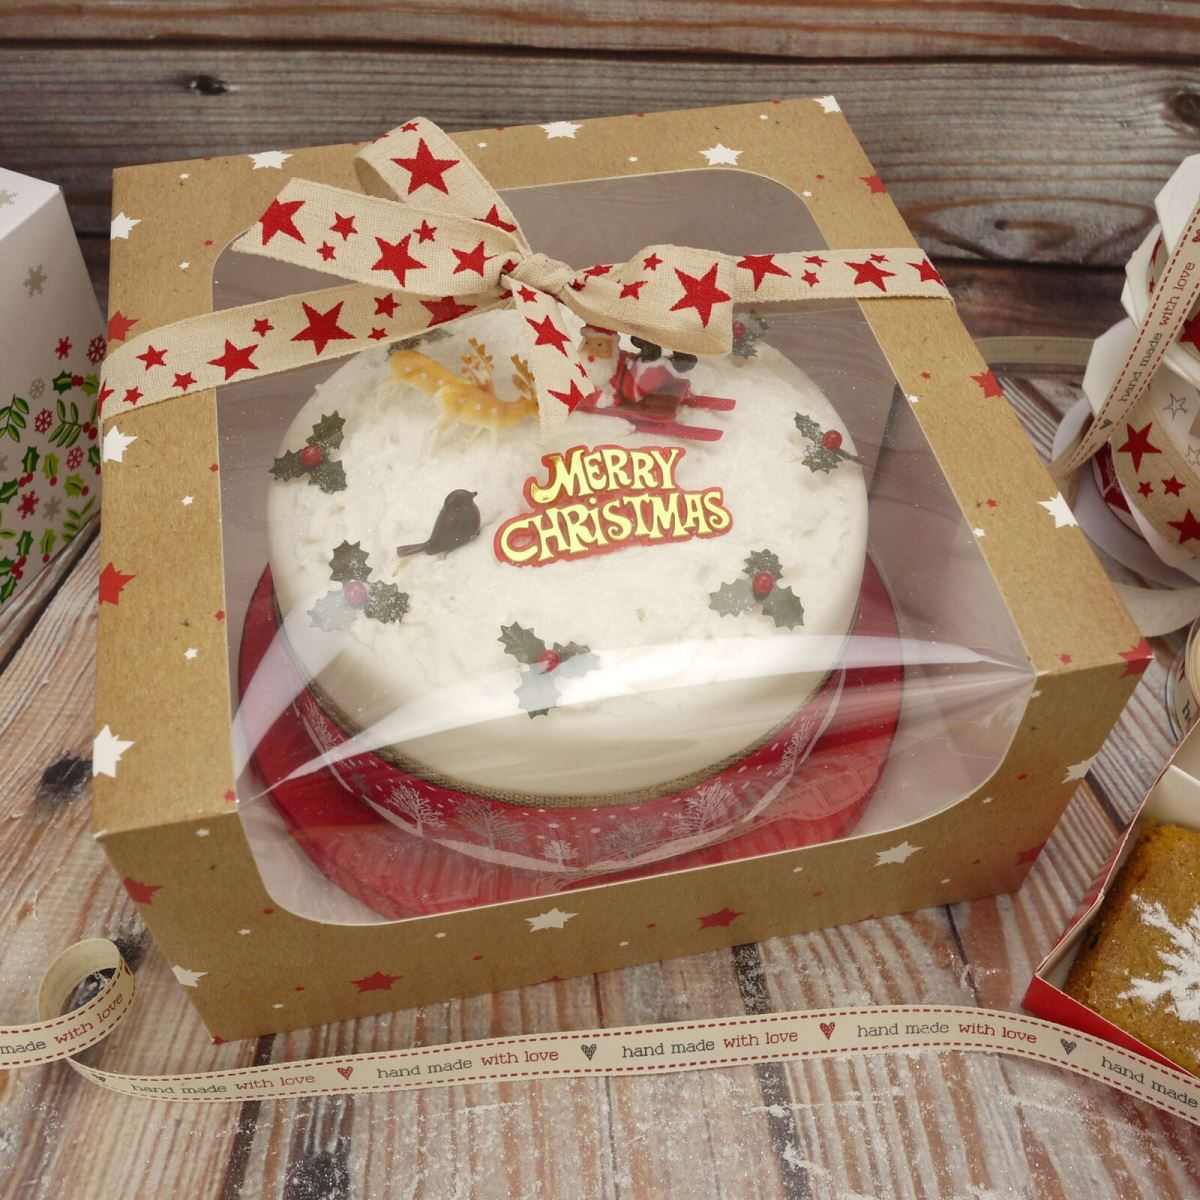 Exclusive new Christmas cake box